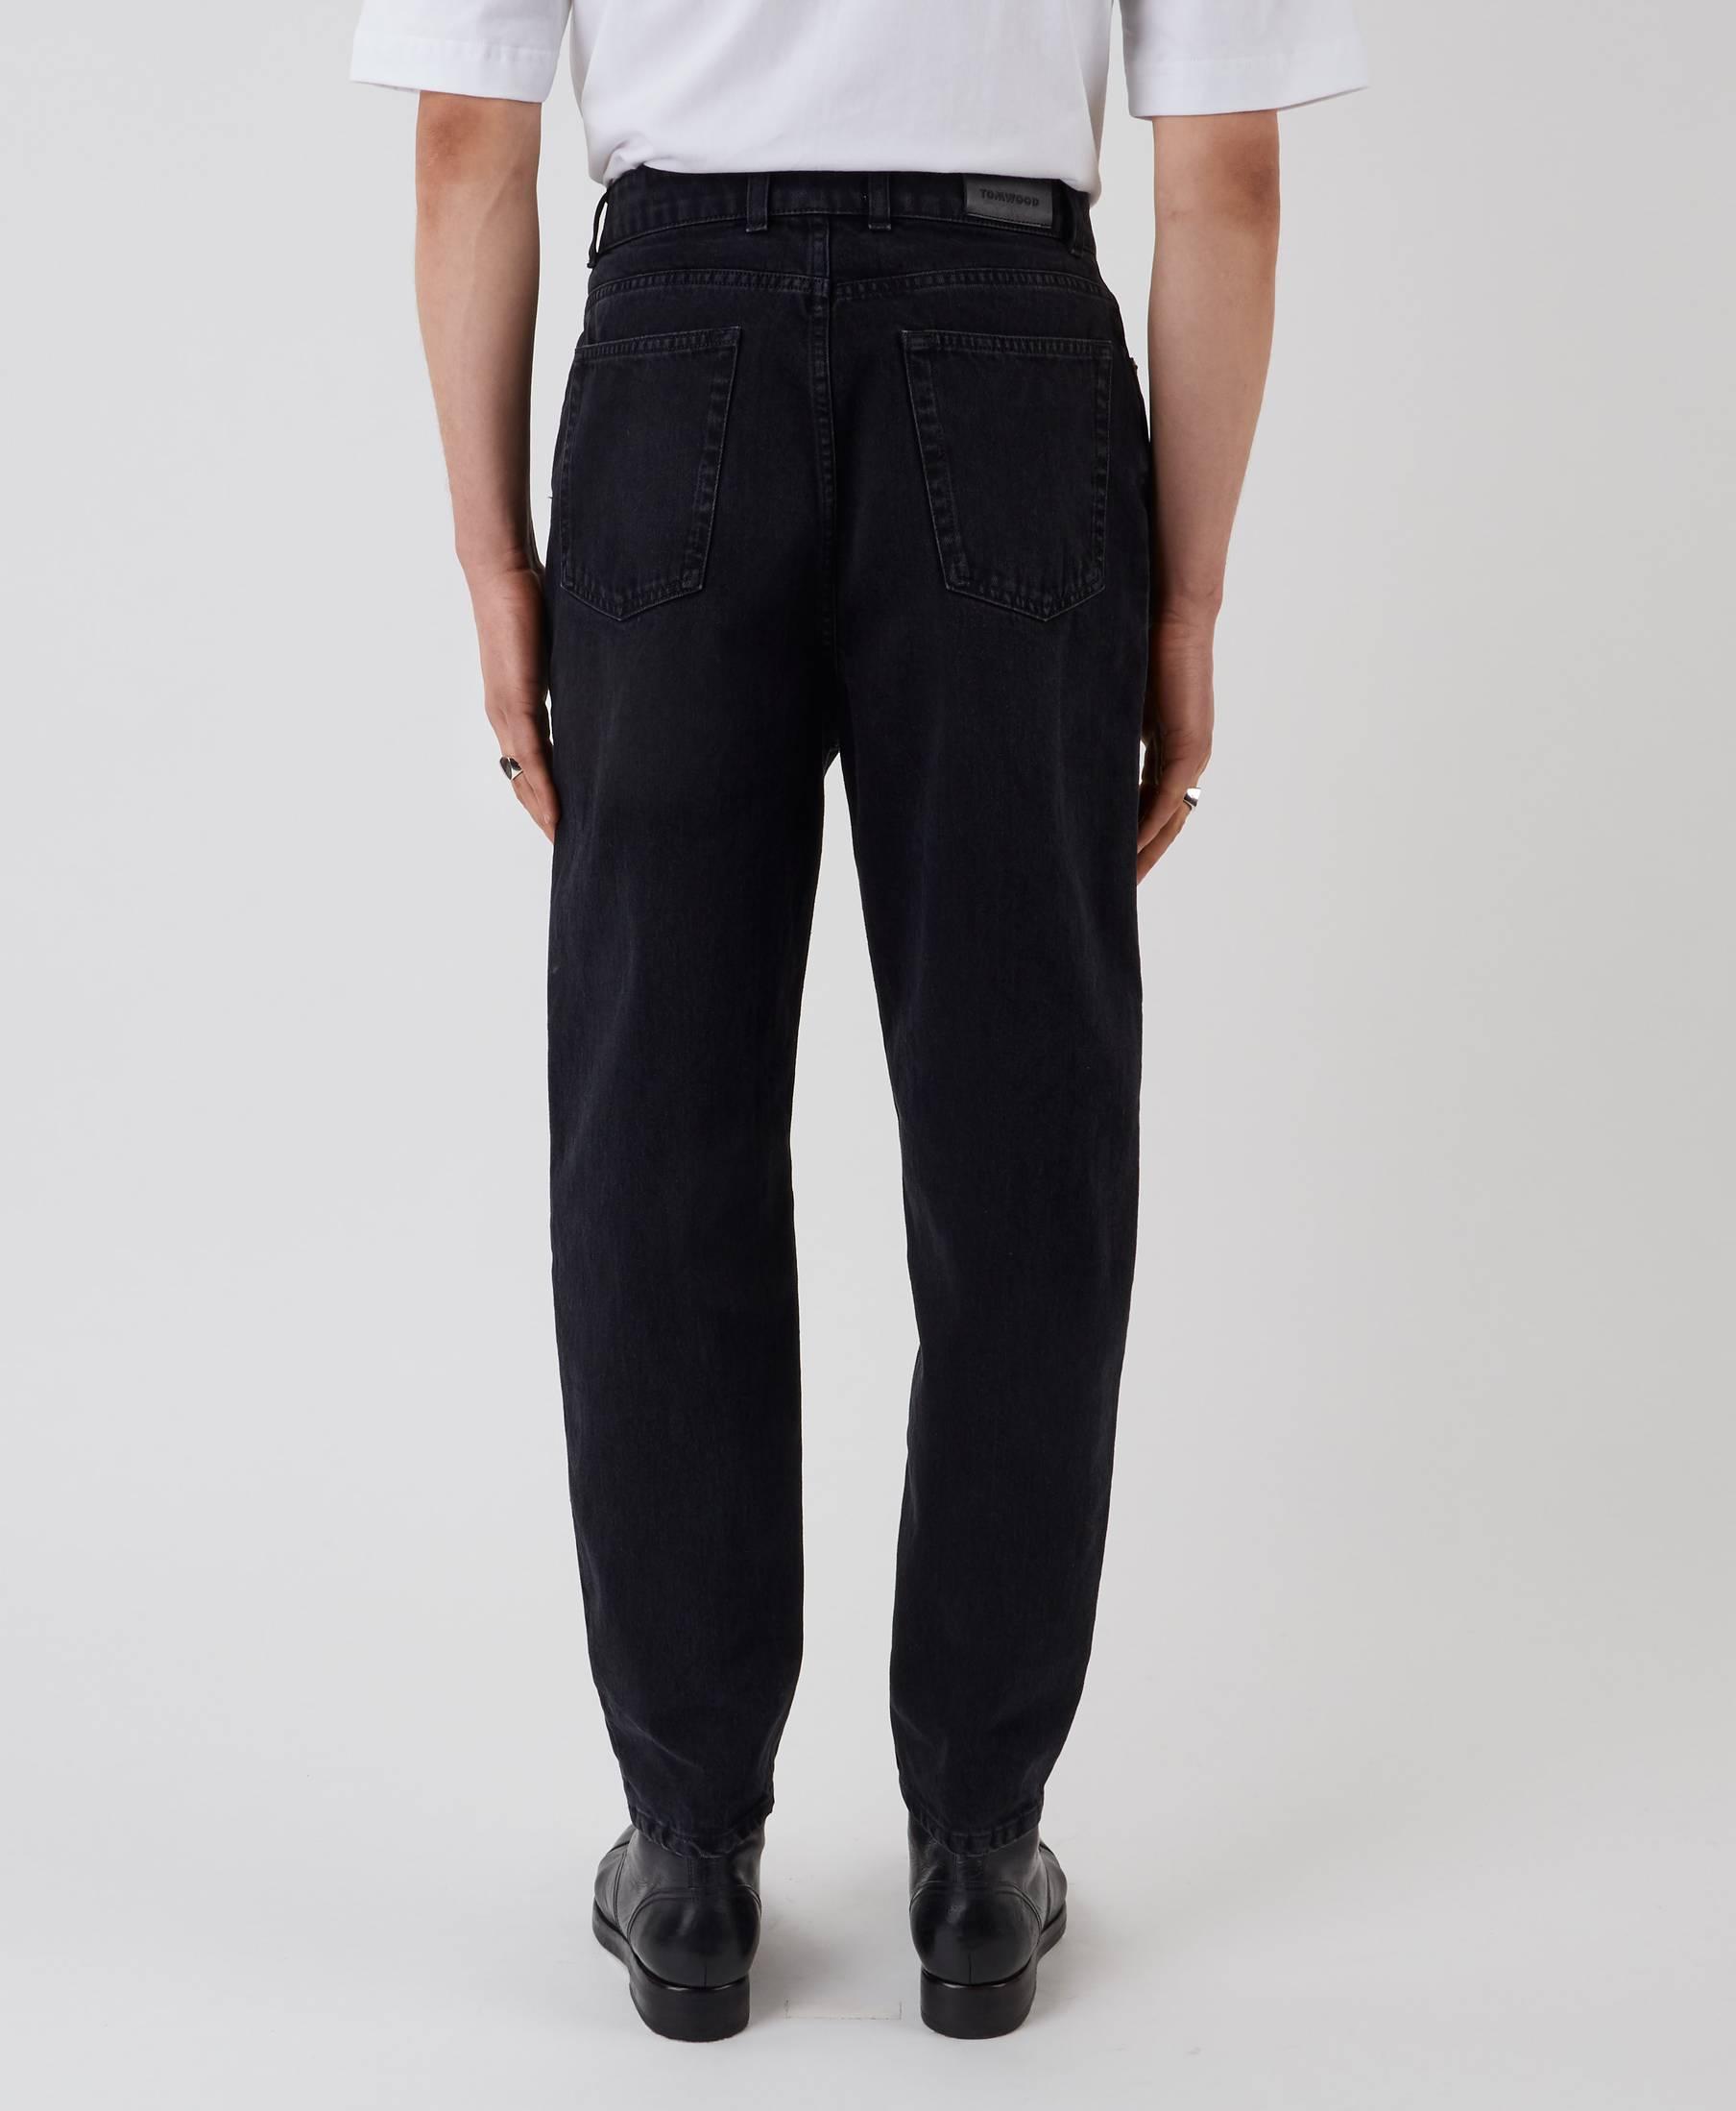 Park Denim Pants Used Black